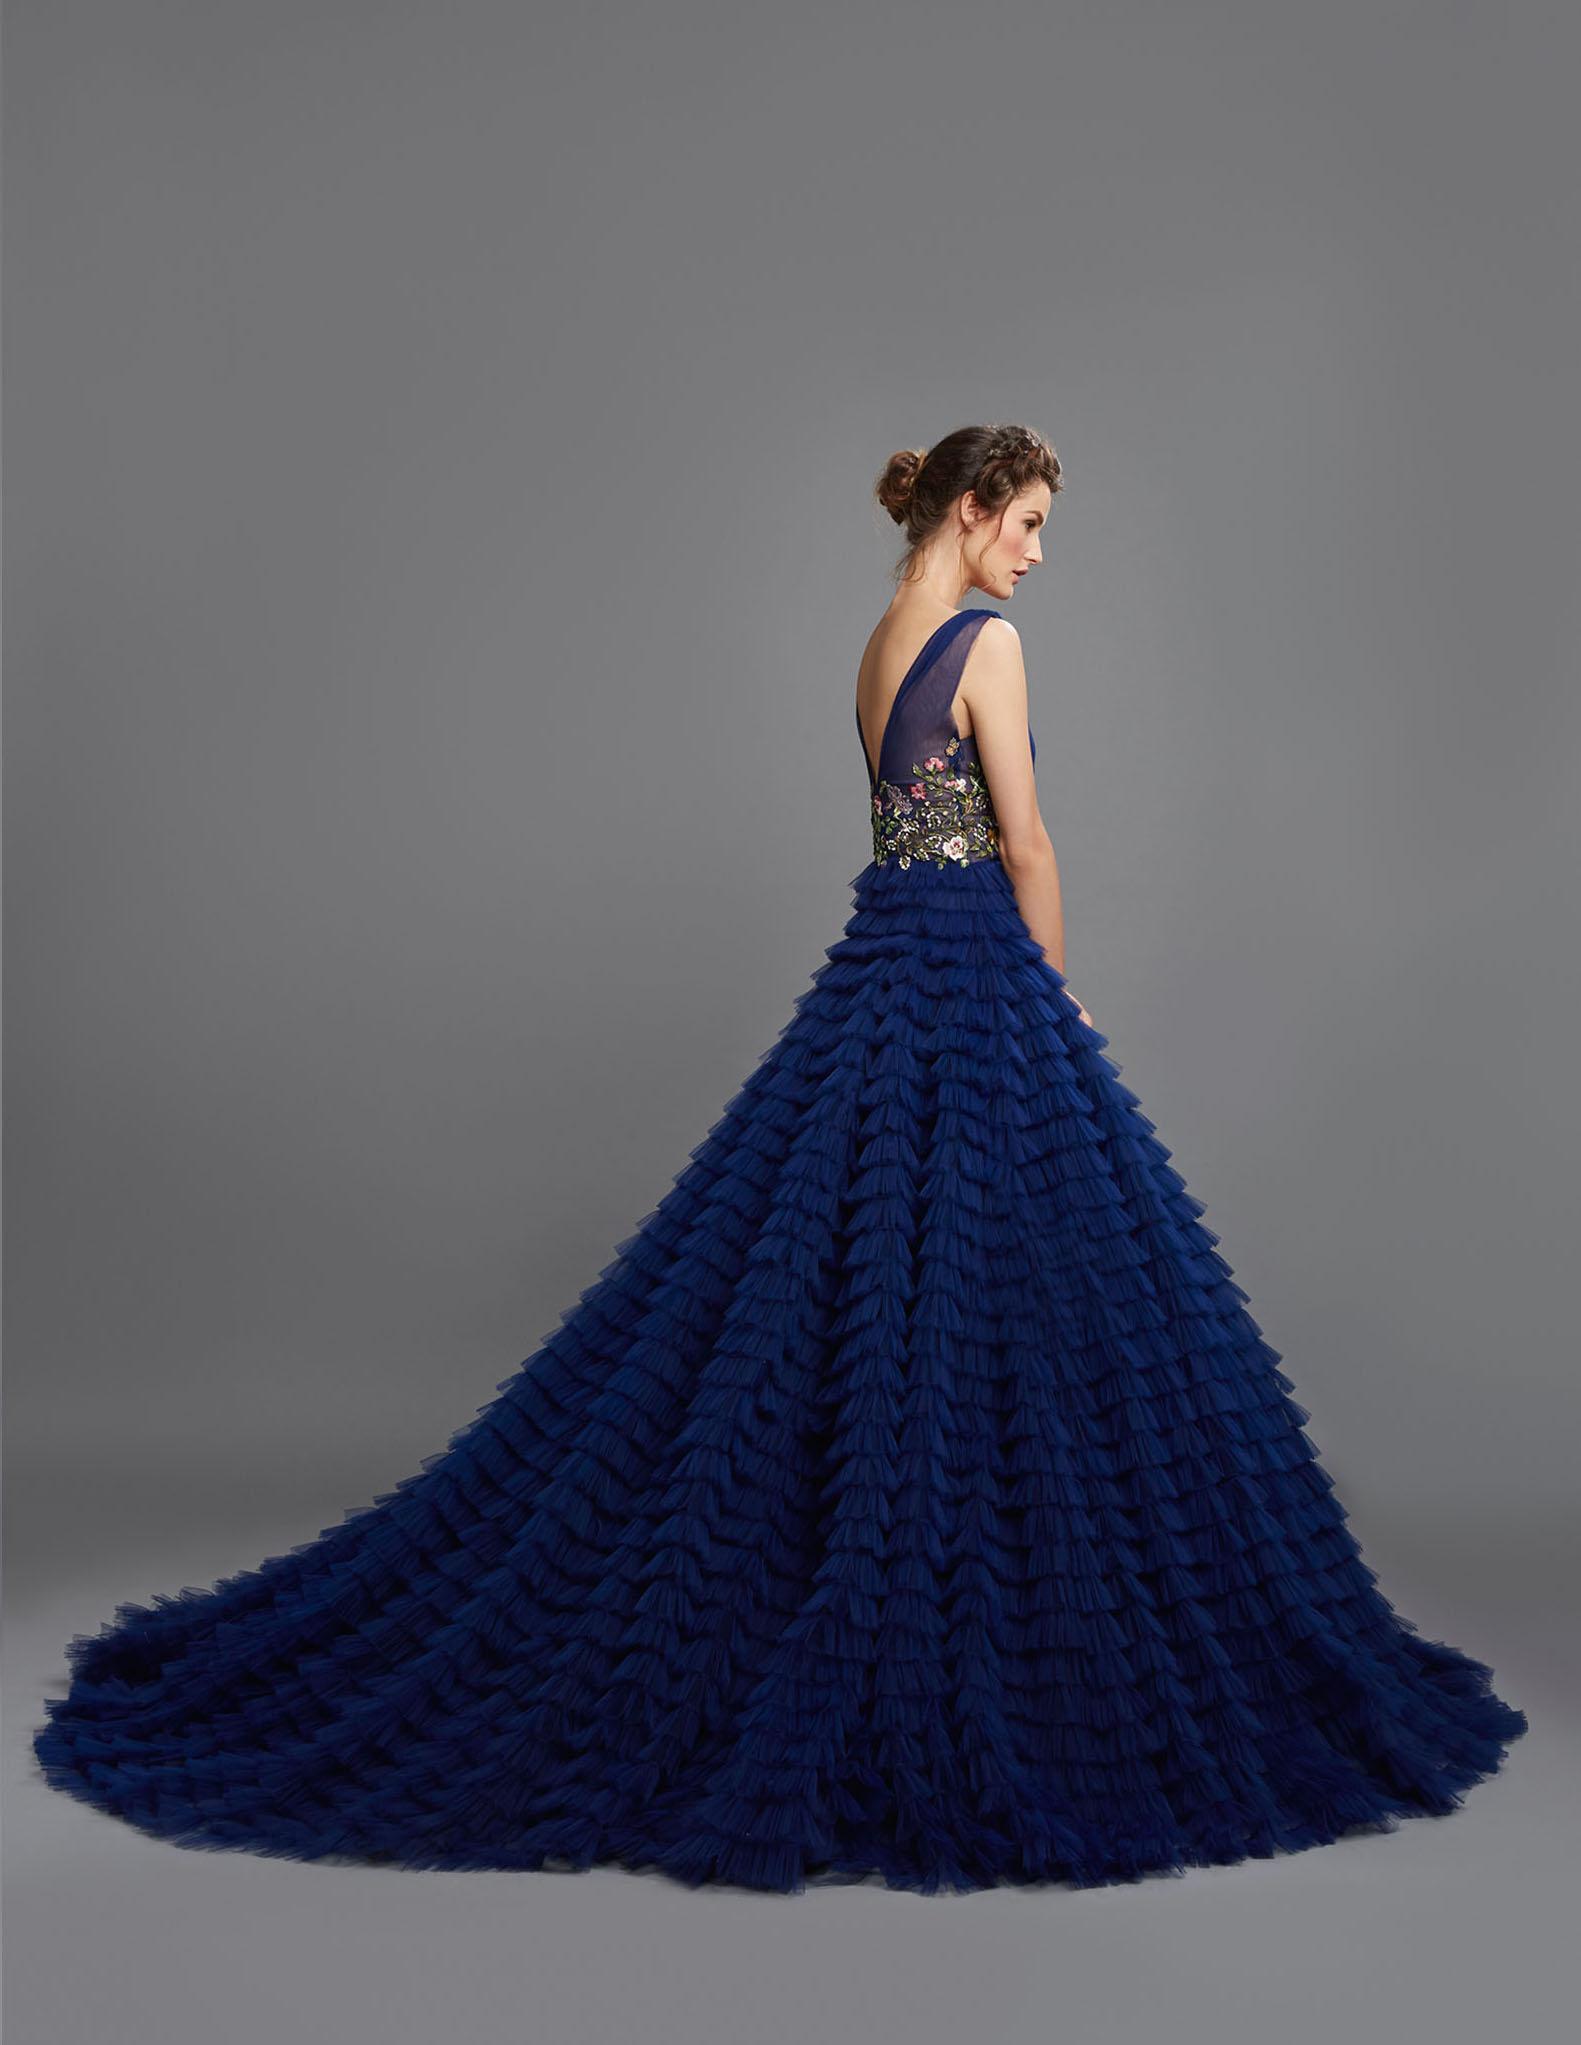 Blue wedding dress Hamda al fahim